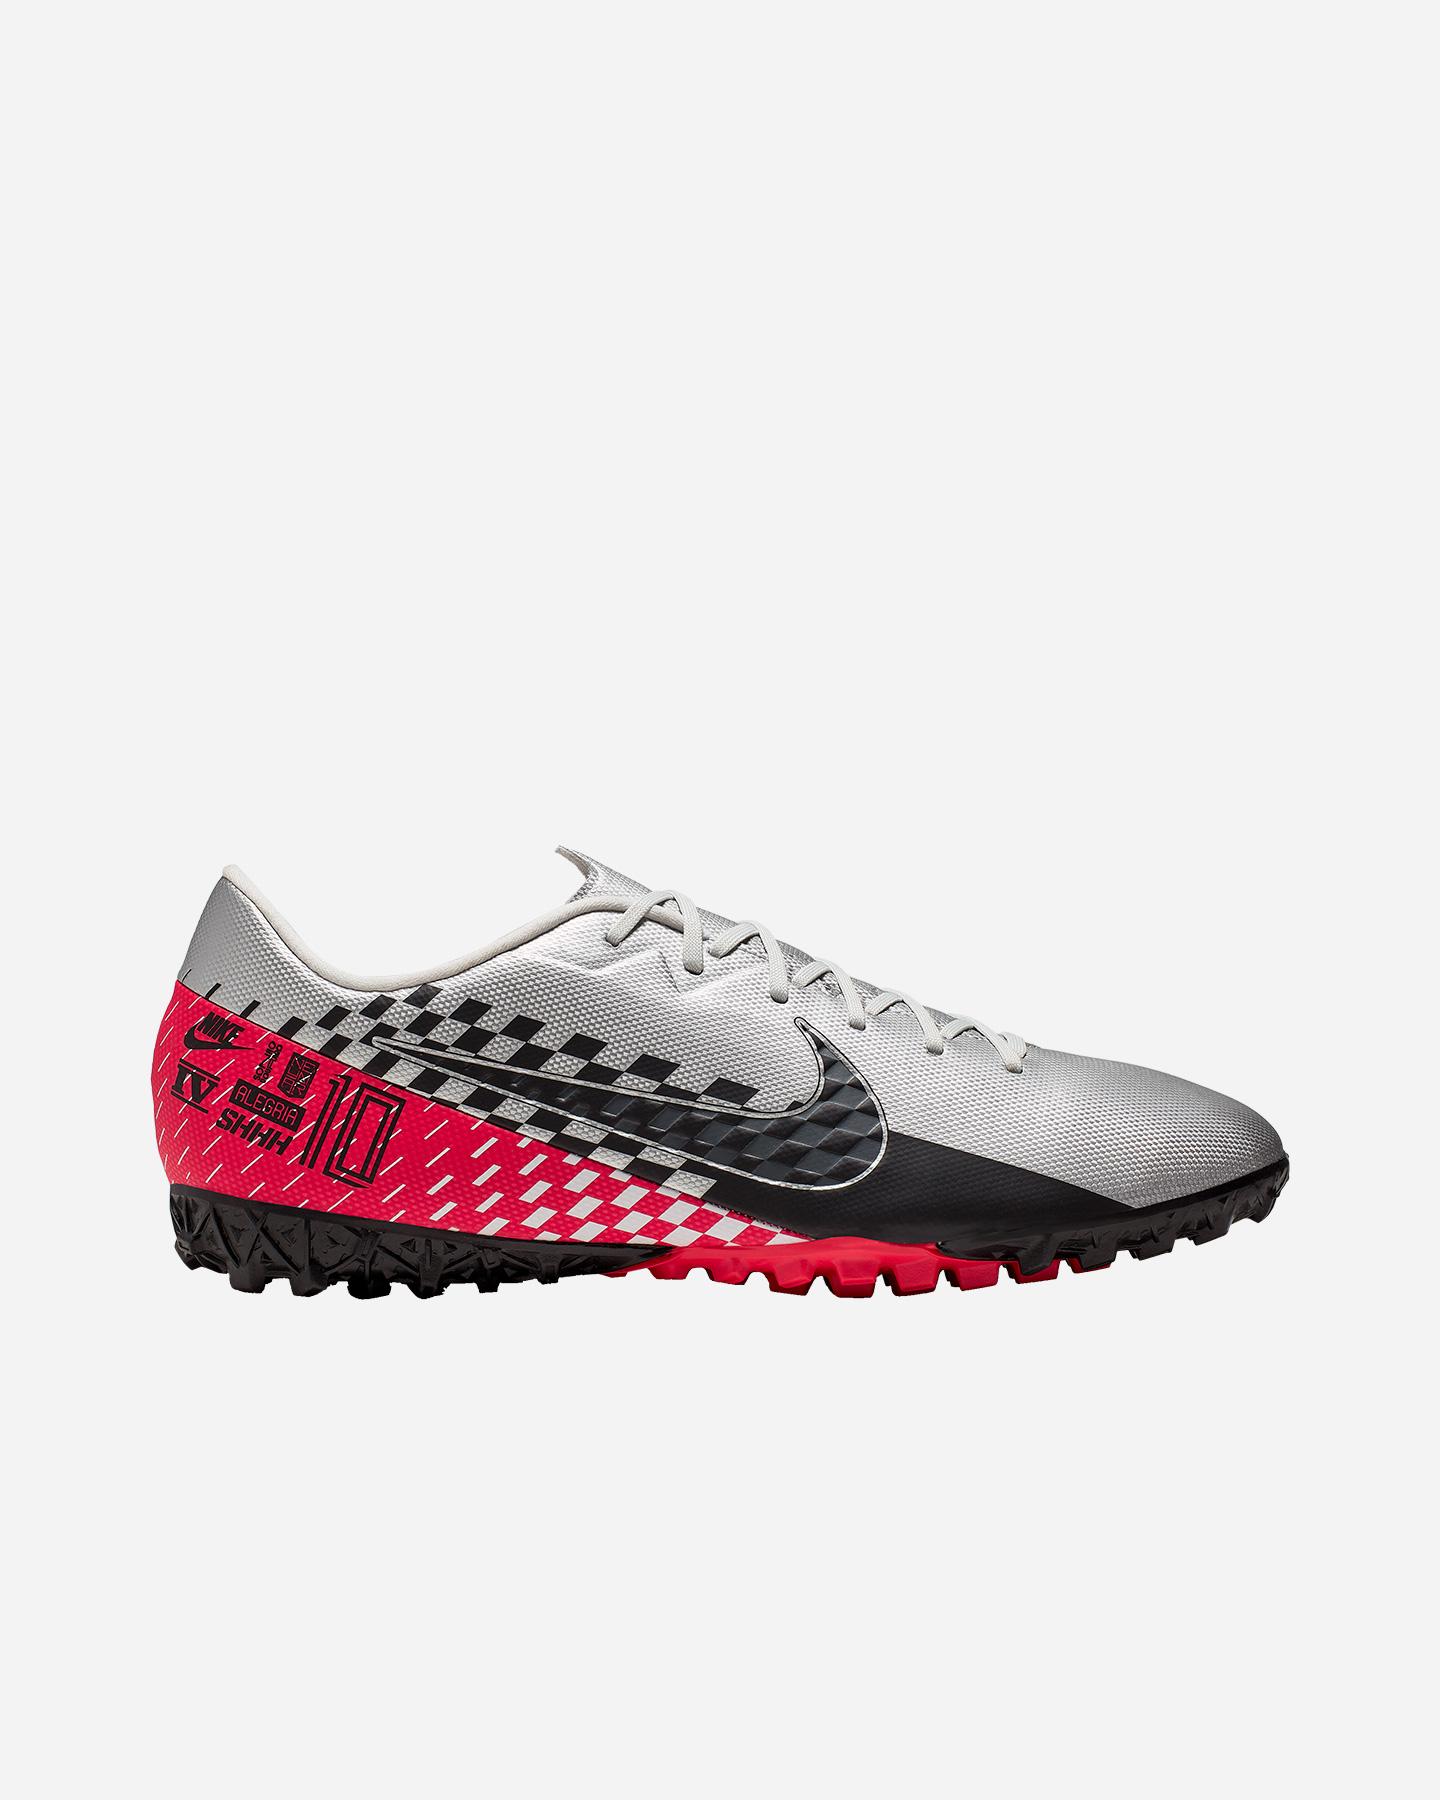 scarpe calcio 31 nike